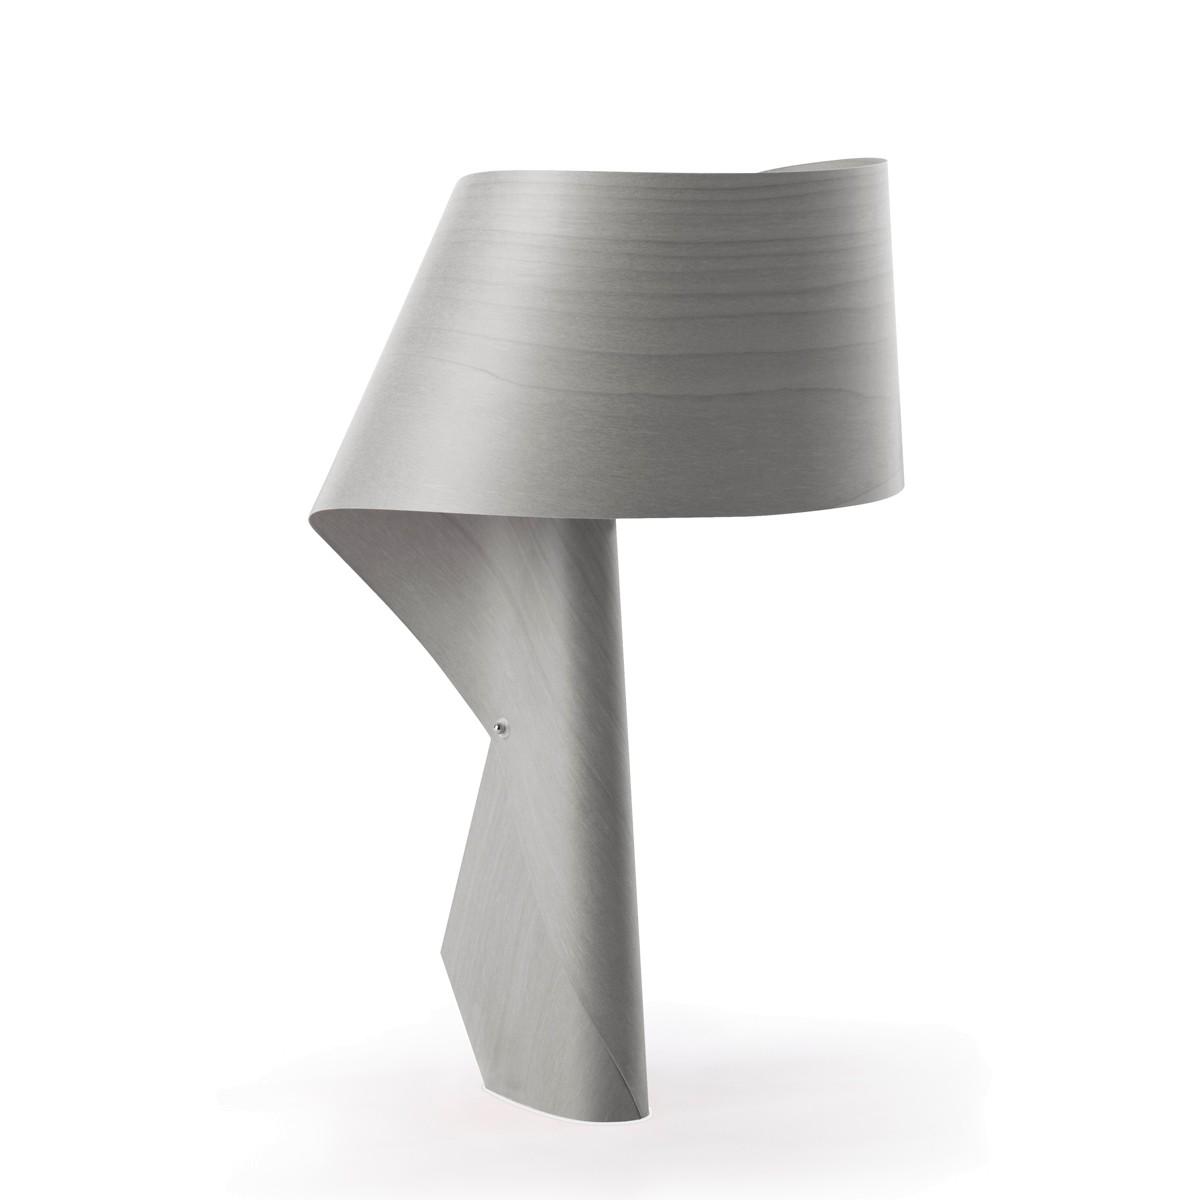 LZF Lamps Air Tischleuchte, grau